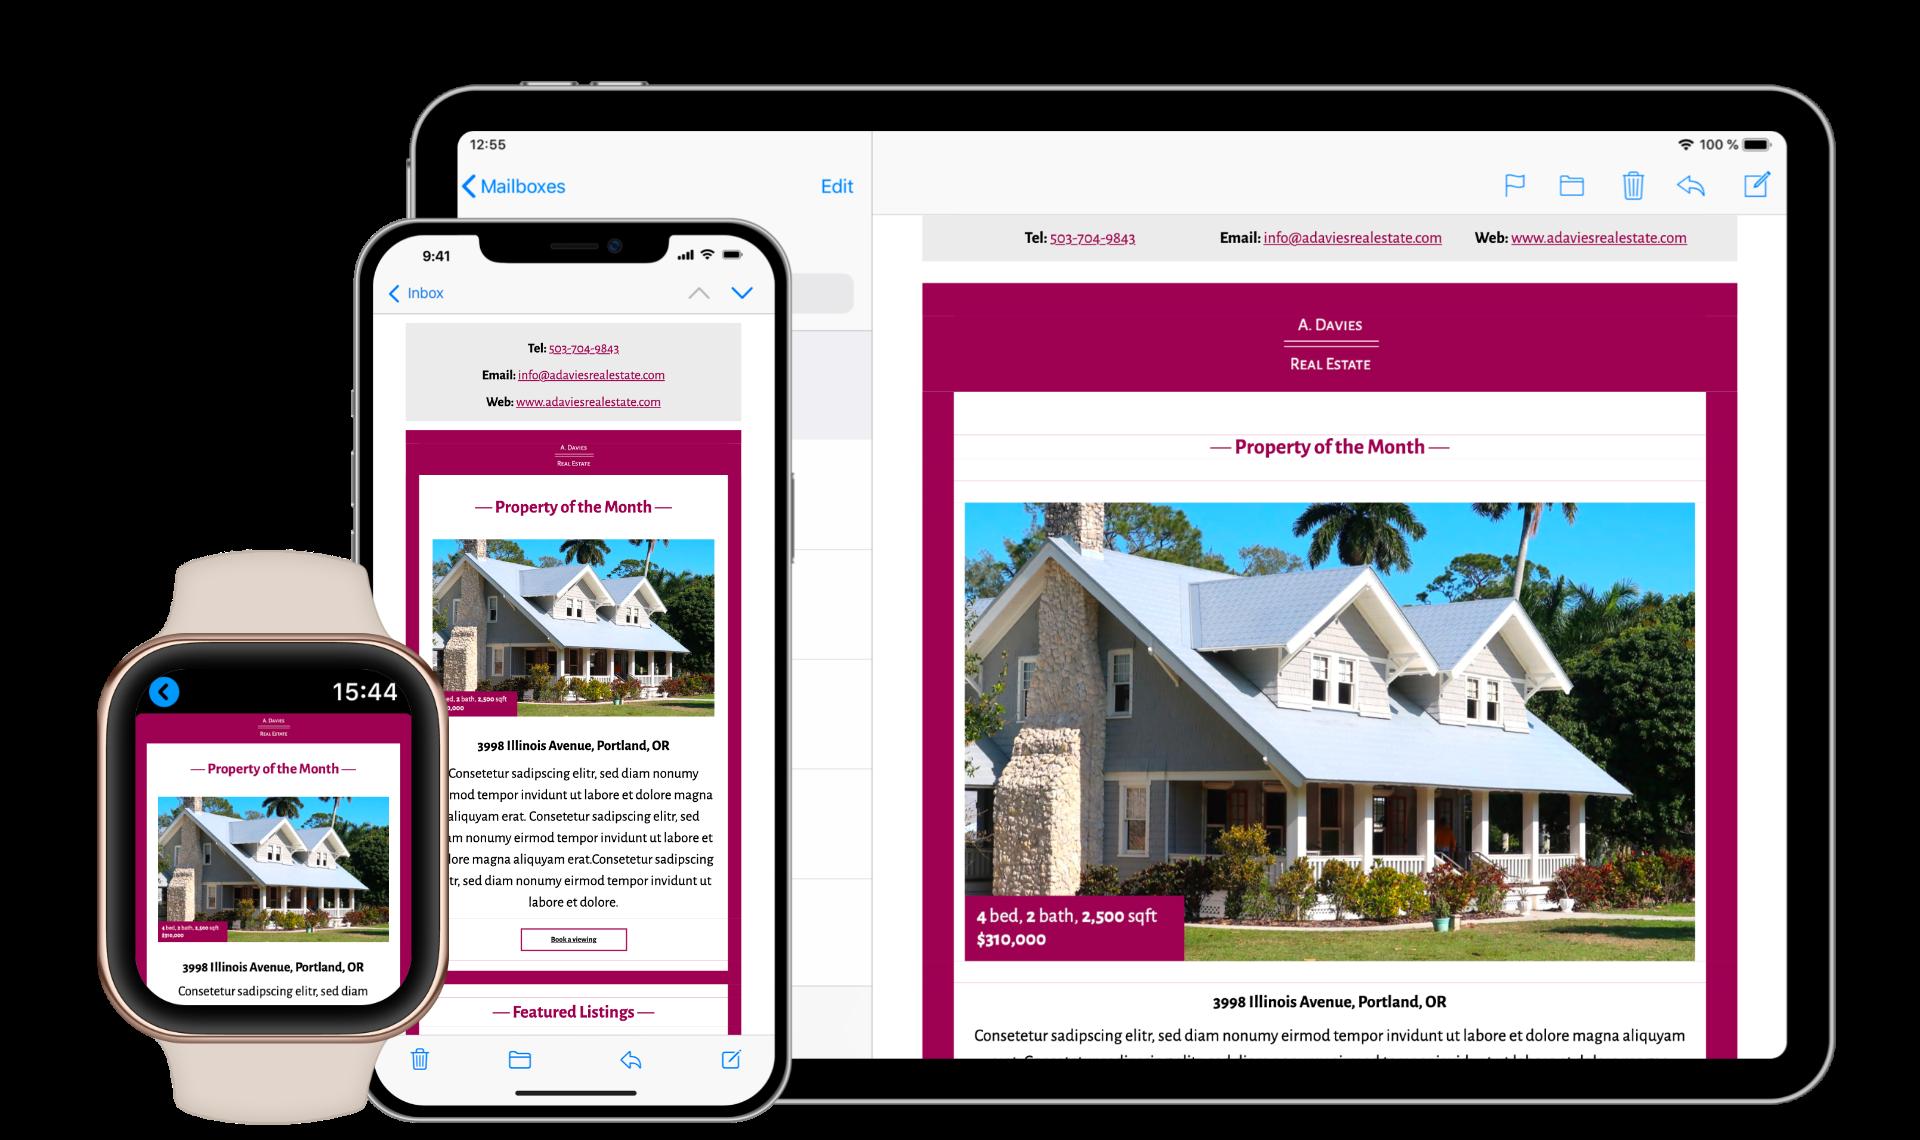 mobile responsive email design in mail designer 365